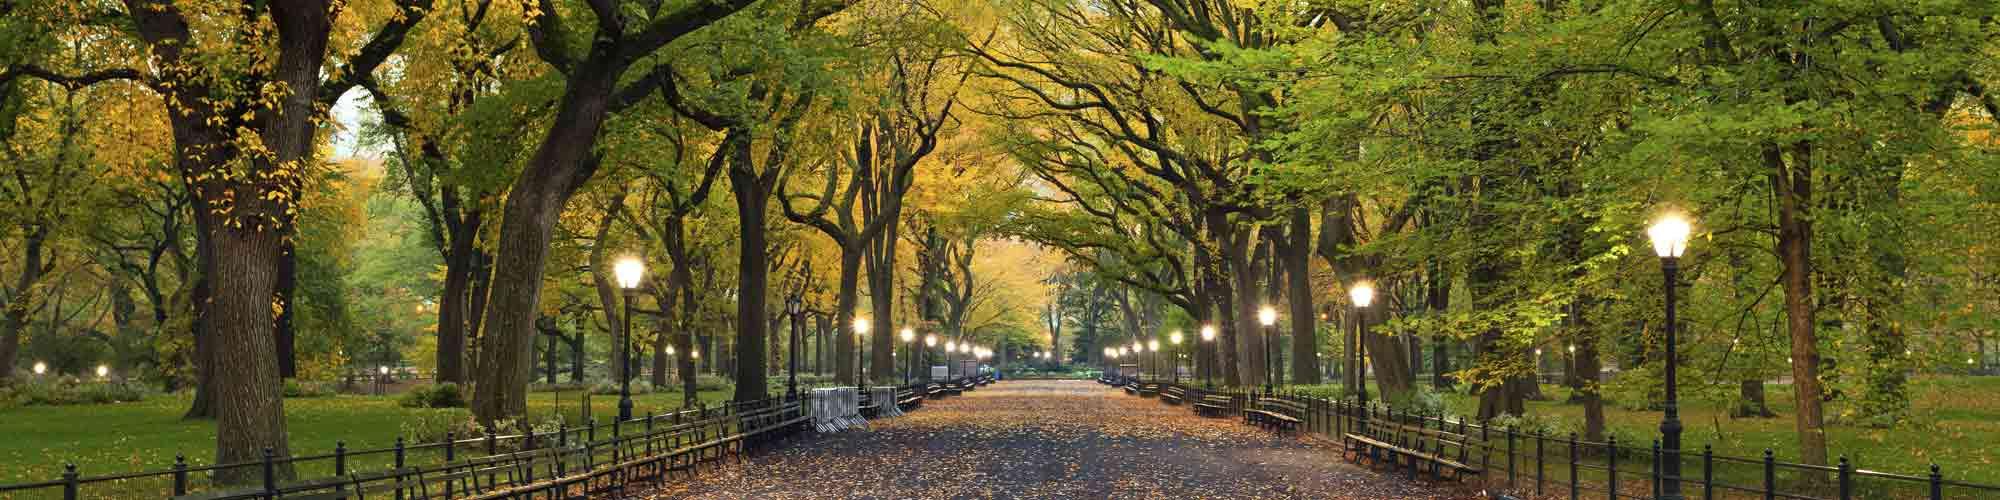 New York Trendy- El Pais Viajes